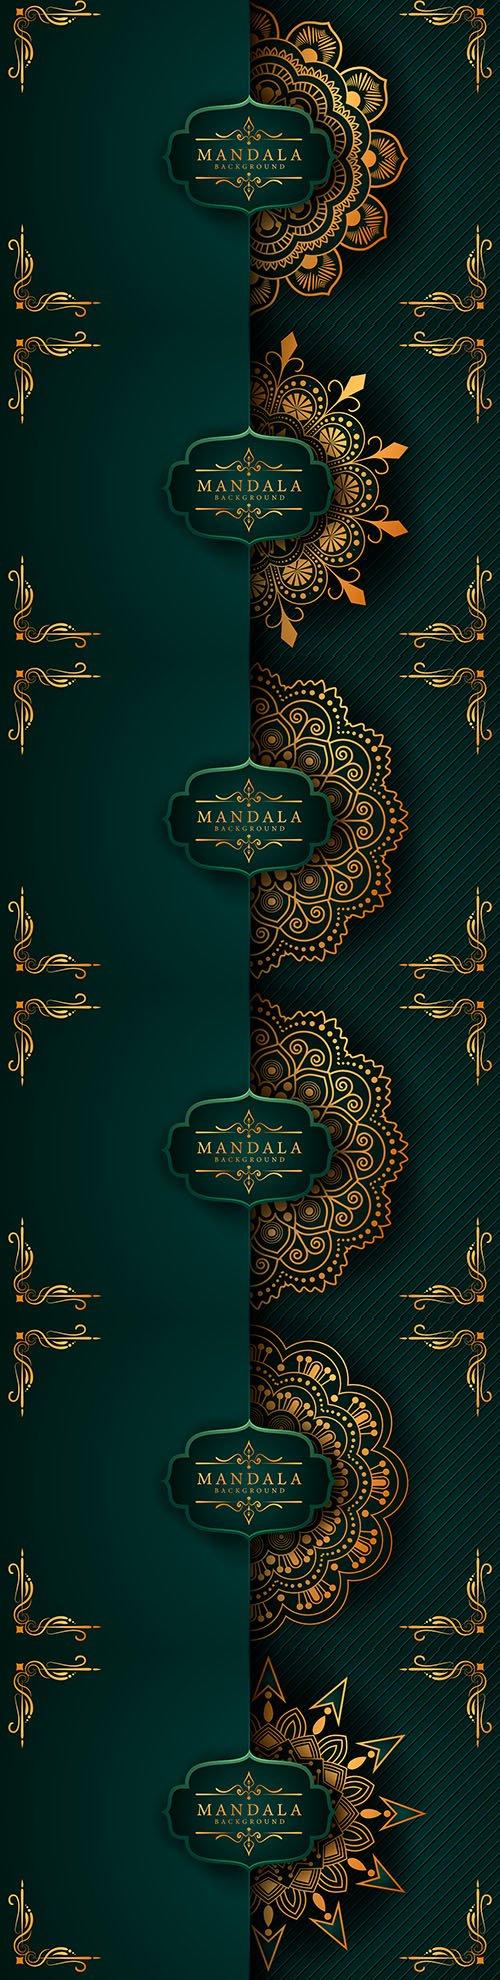 Mandala creative luxury green design background 7